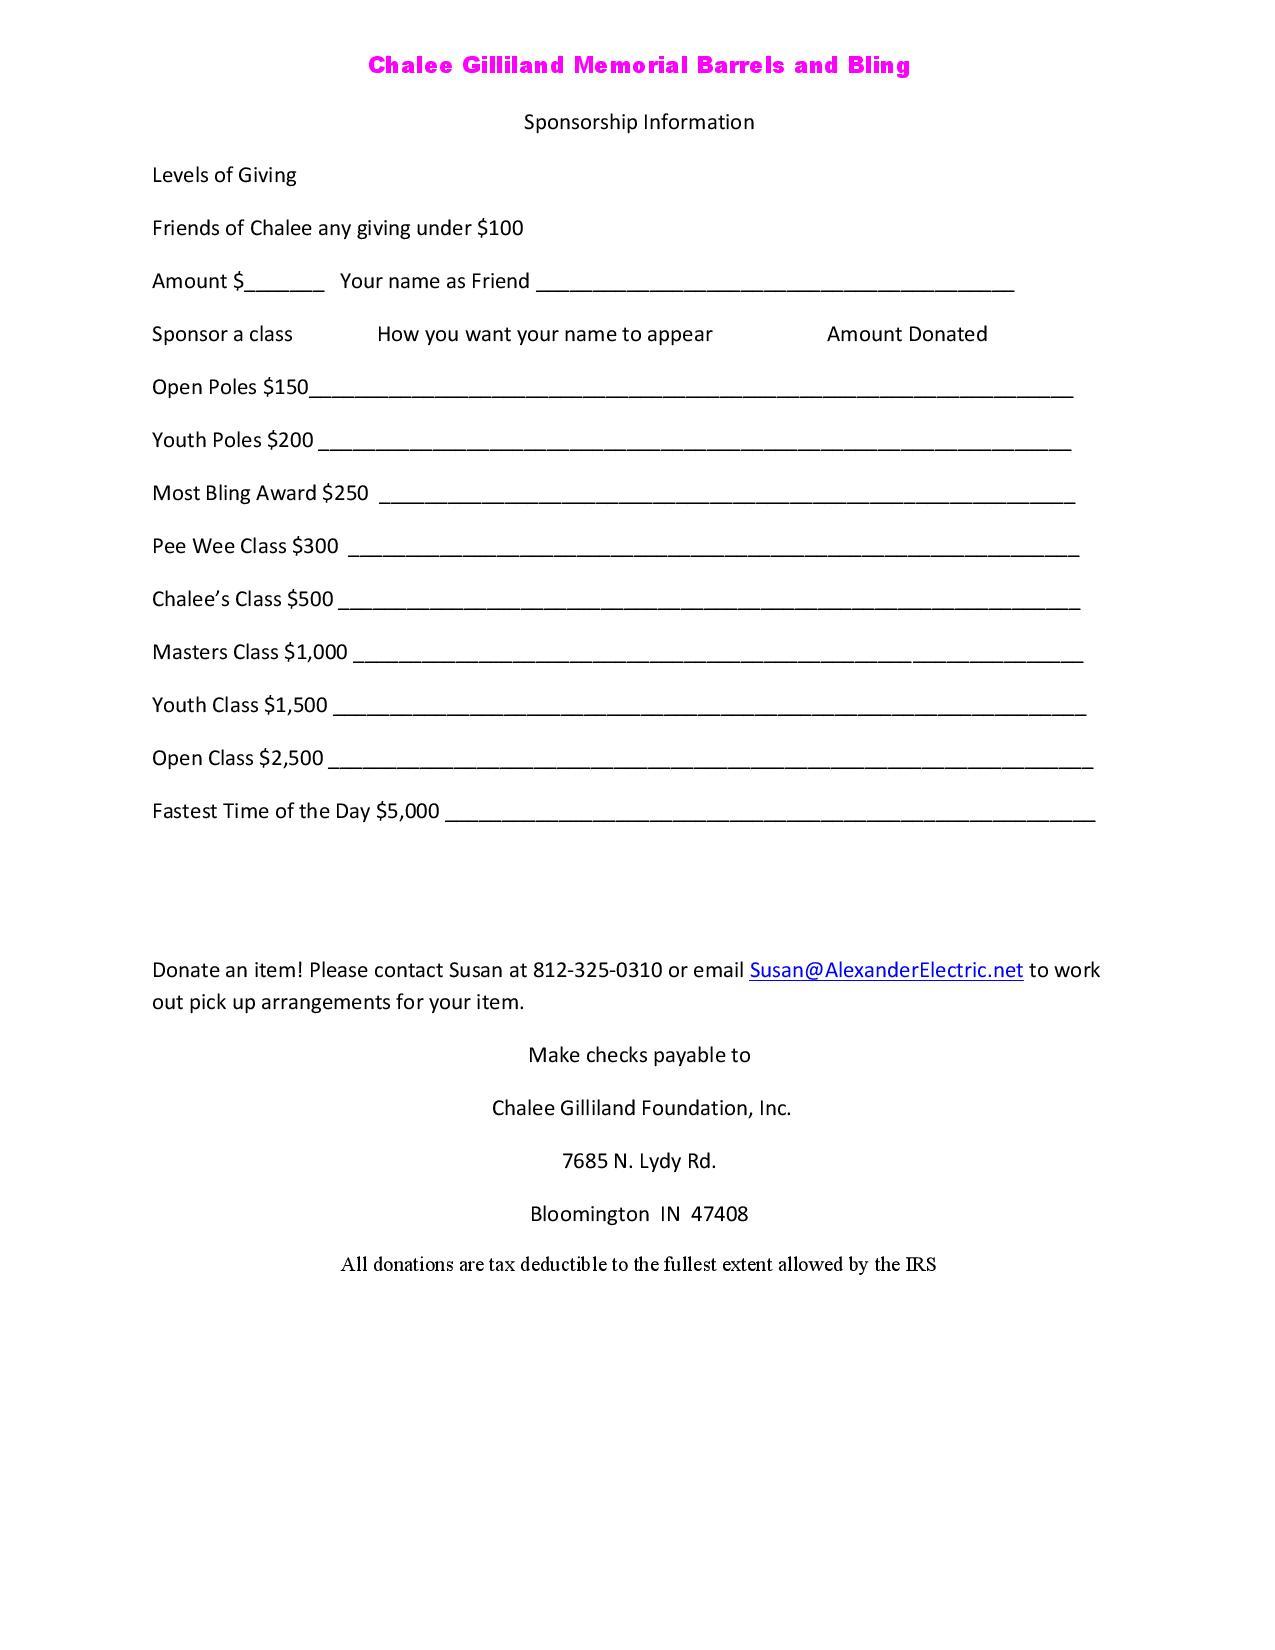 CGMBB Sponsor form .jpg